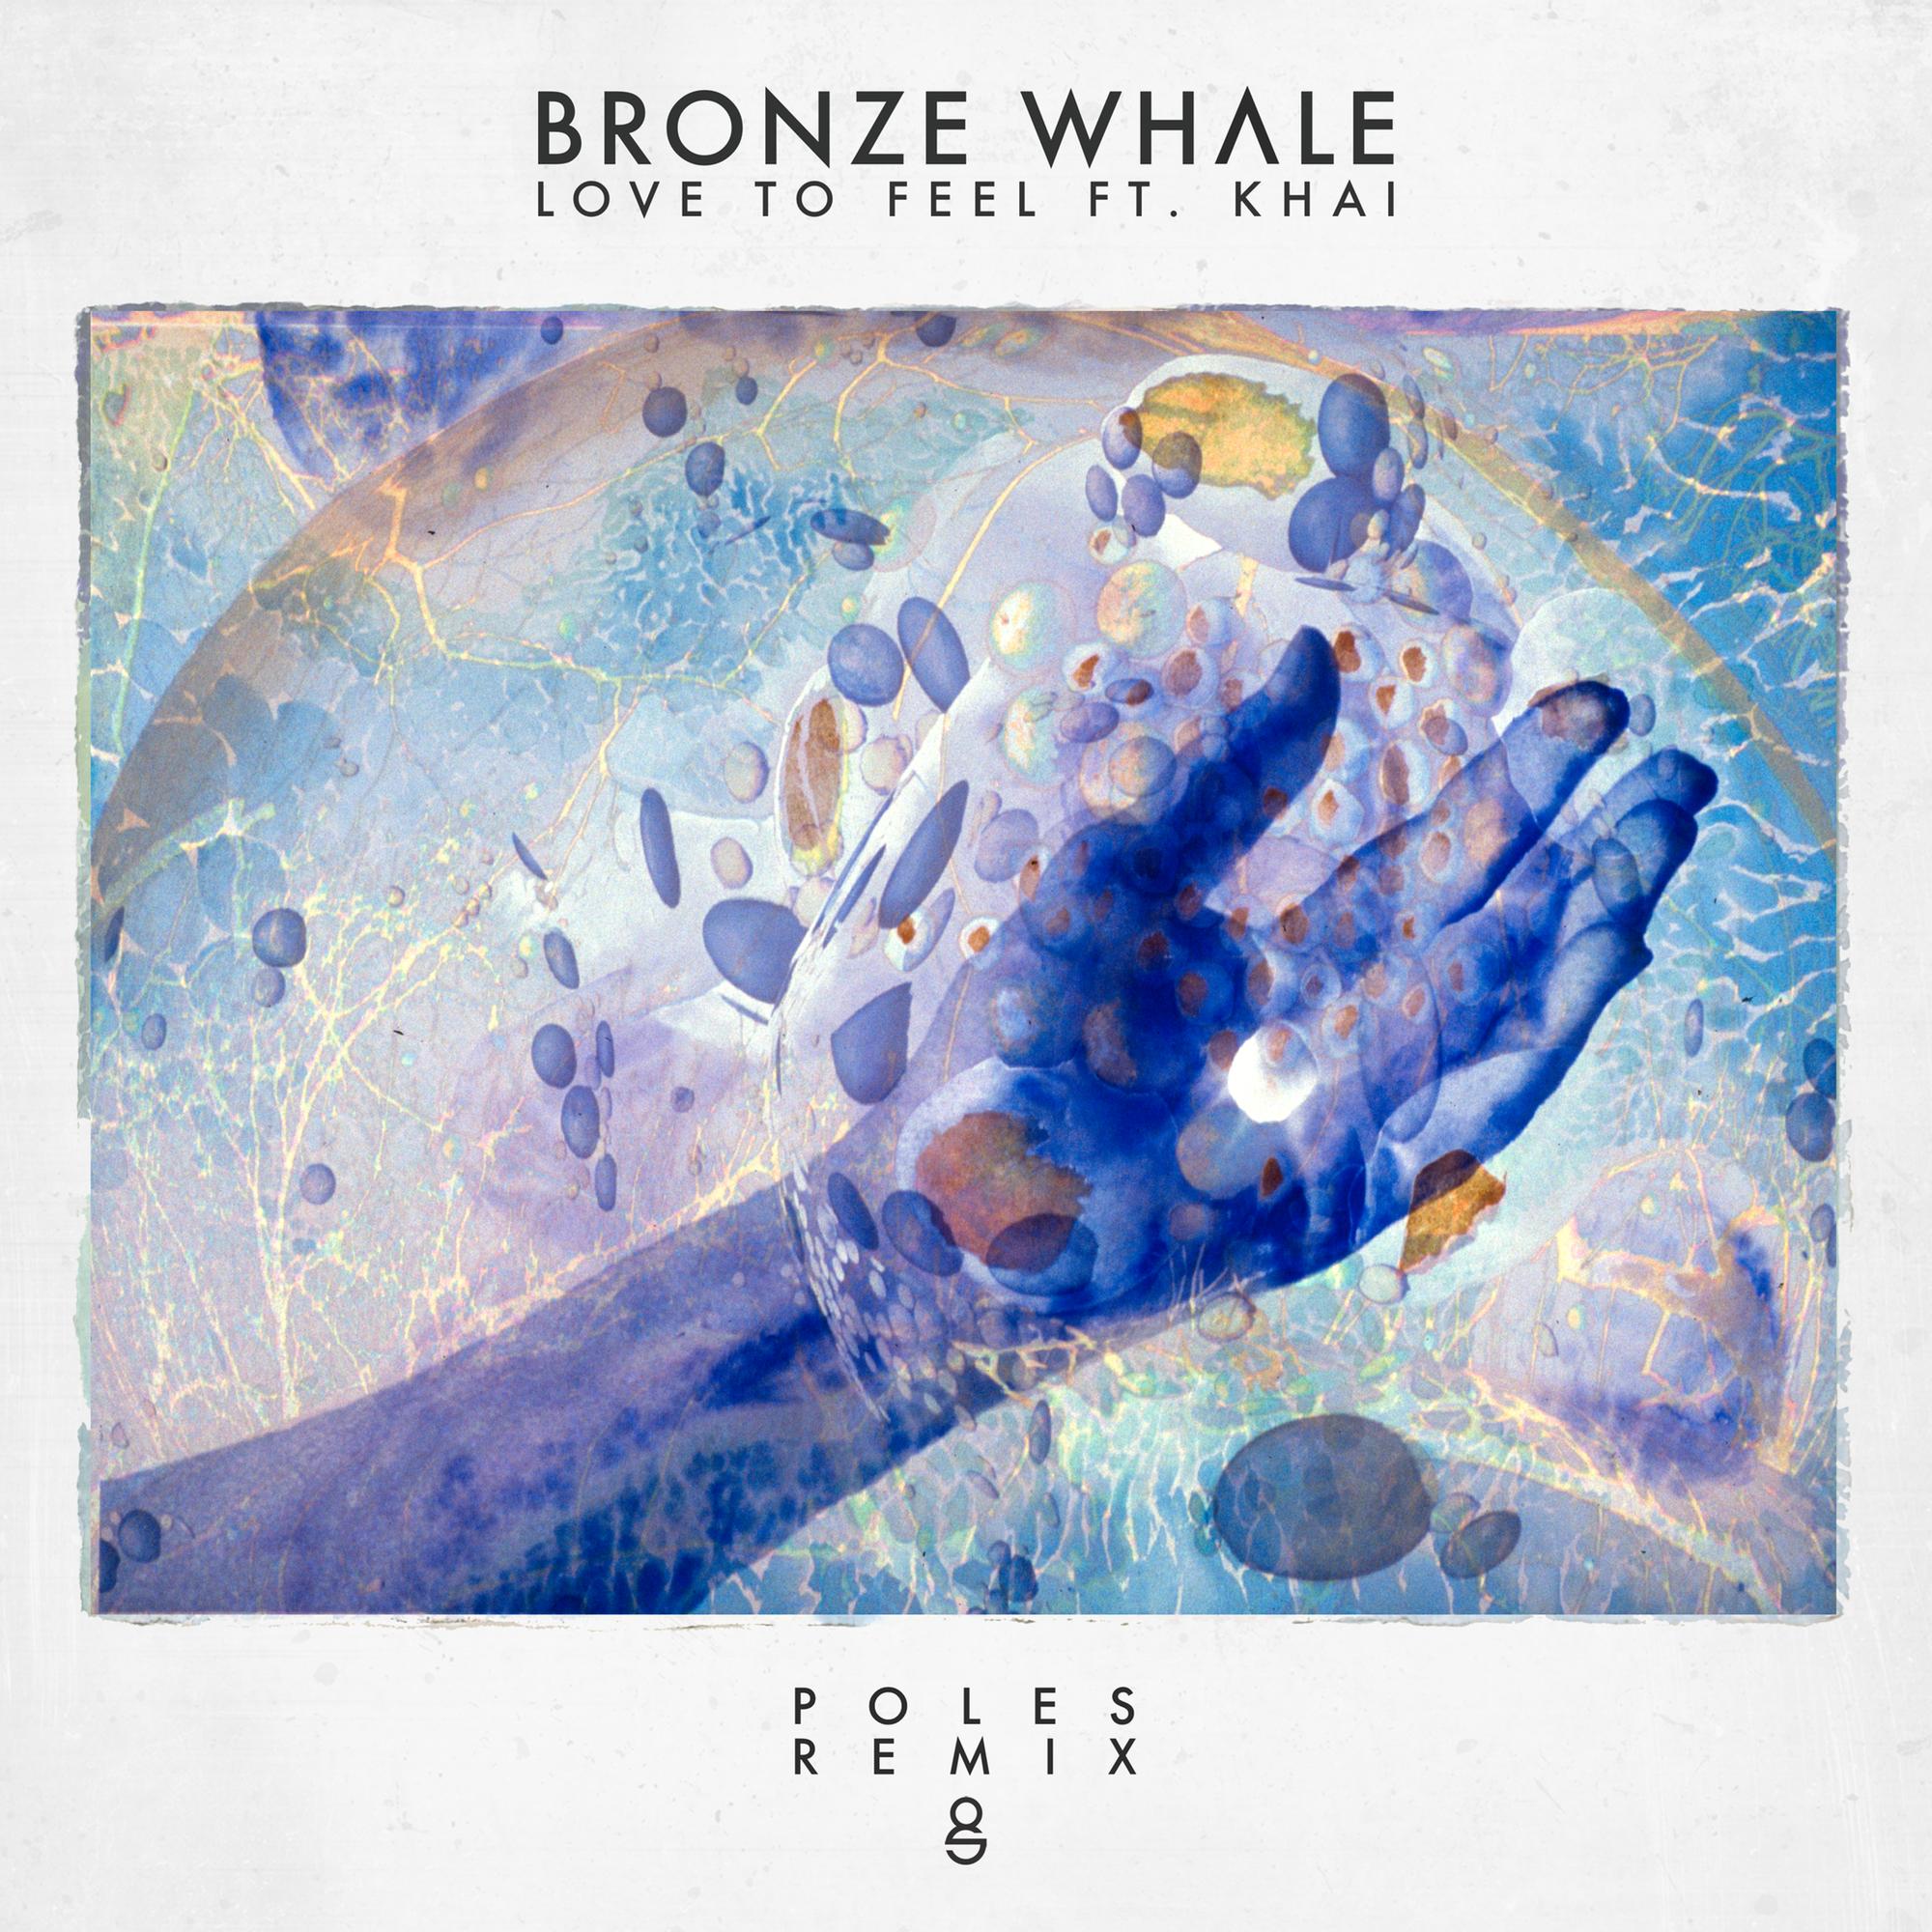 BRONZE WHALE - LOVE TO FEEL       FT. KHAI (POLES REMIX)